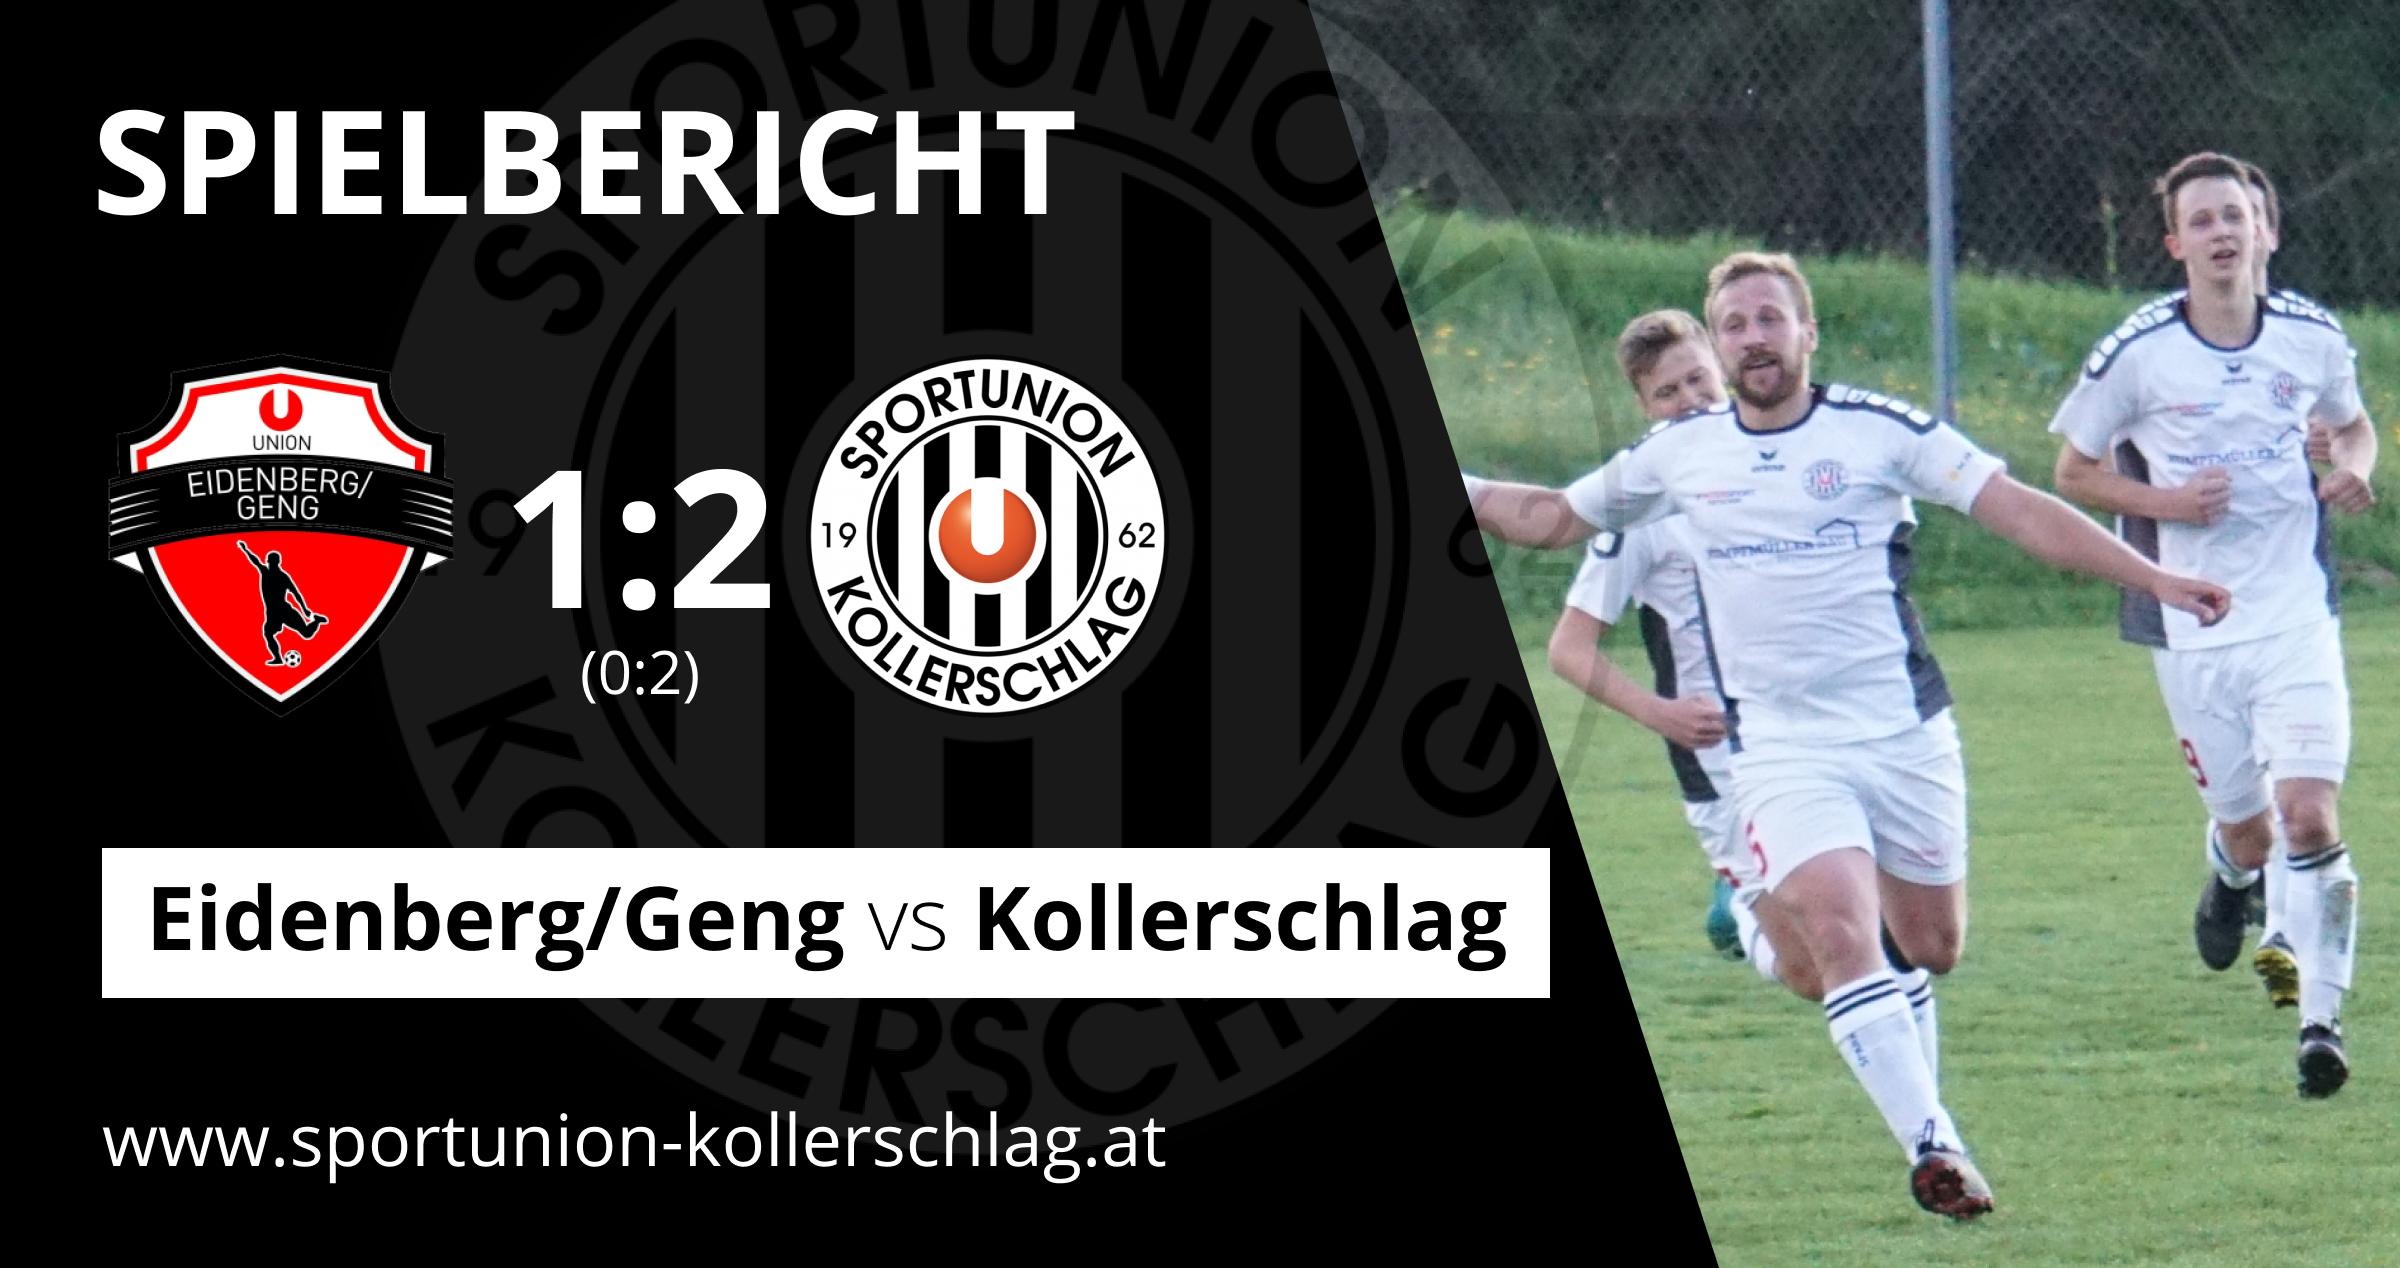 Friedl-Doppelpack! 2:1 Auswärtssieg in Eidenberg/Geng